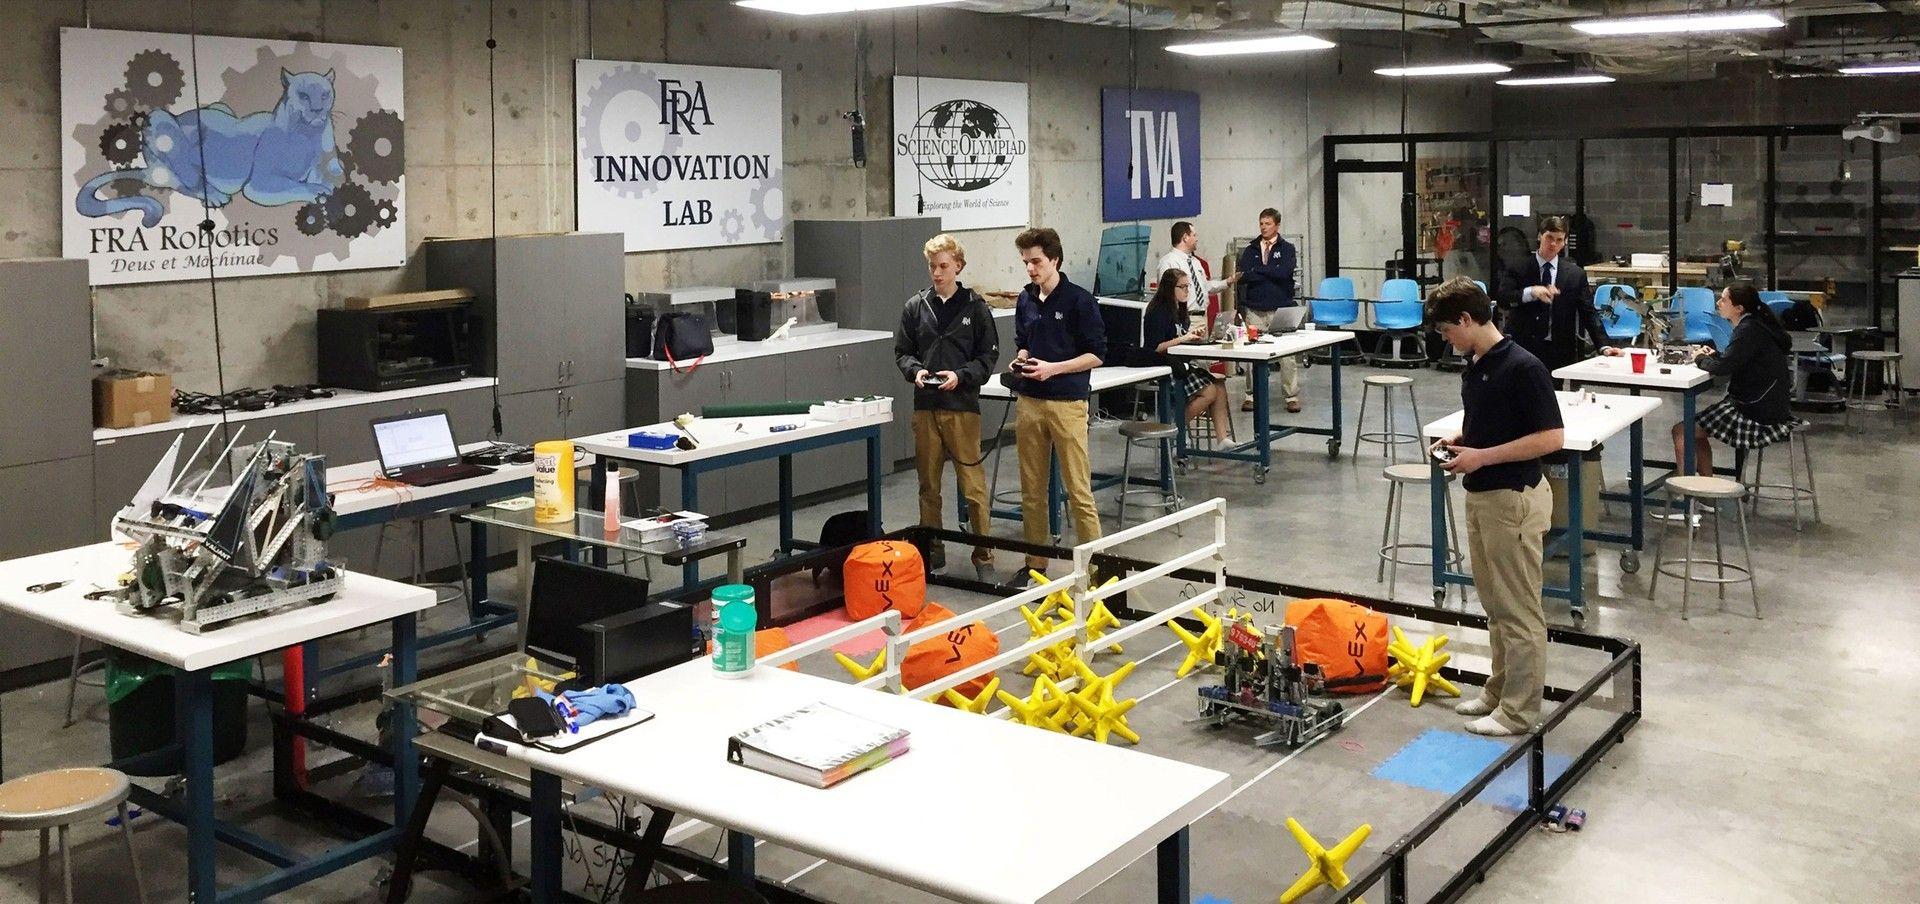 image result for high school robotics lab